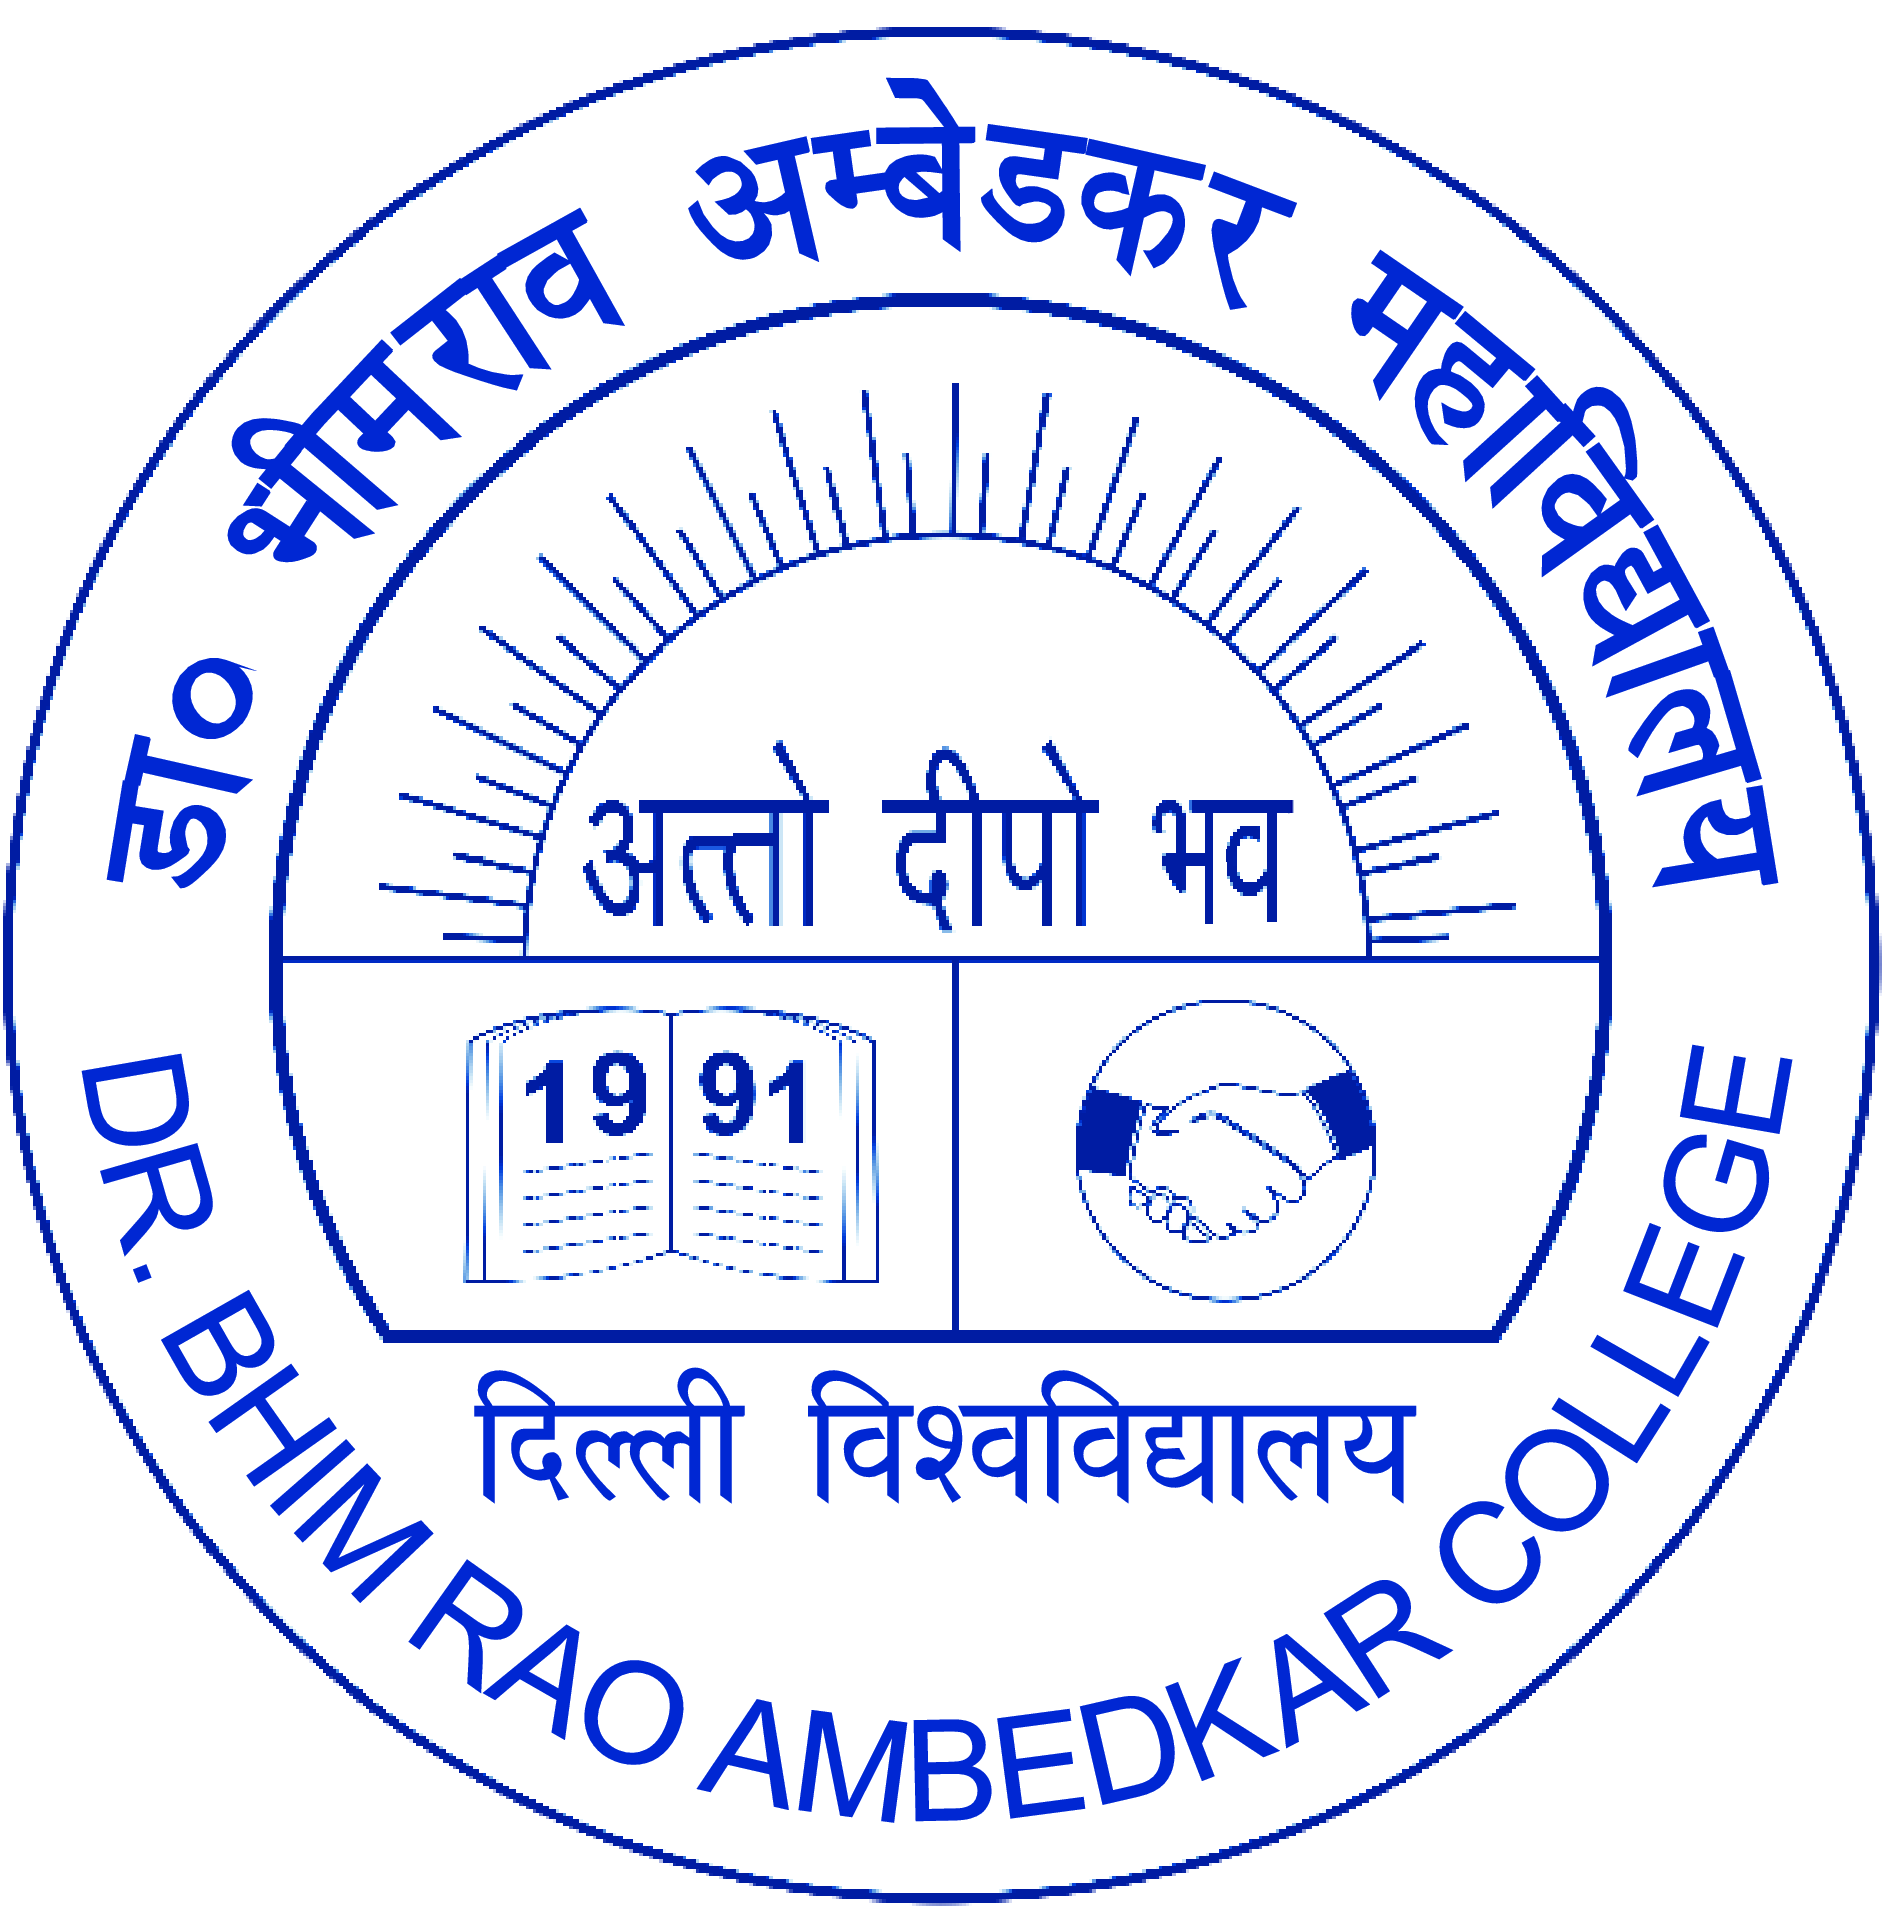 Bhim Rao Ambedkar College, Delhi